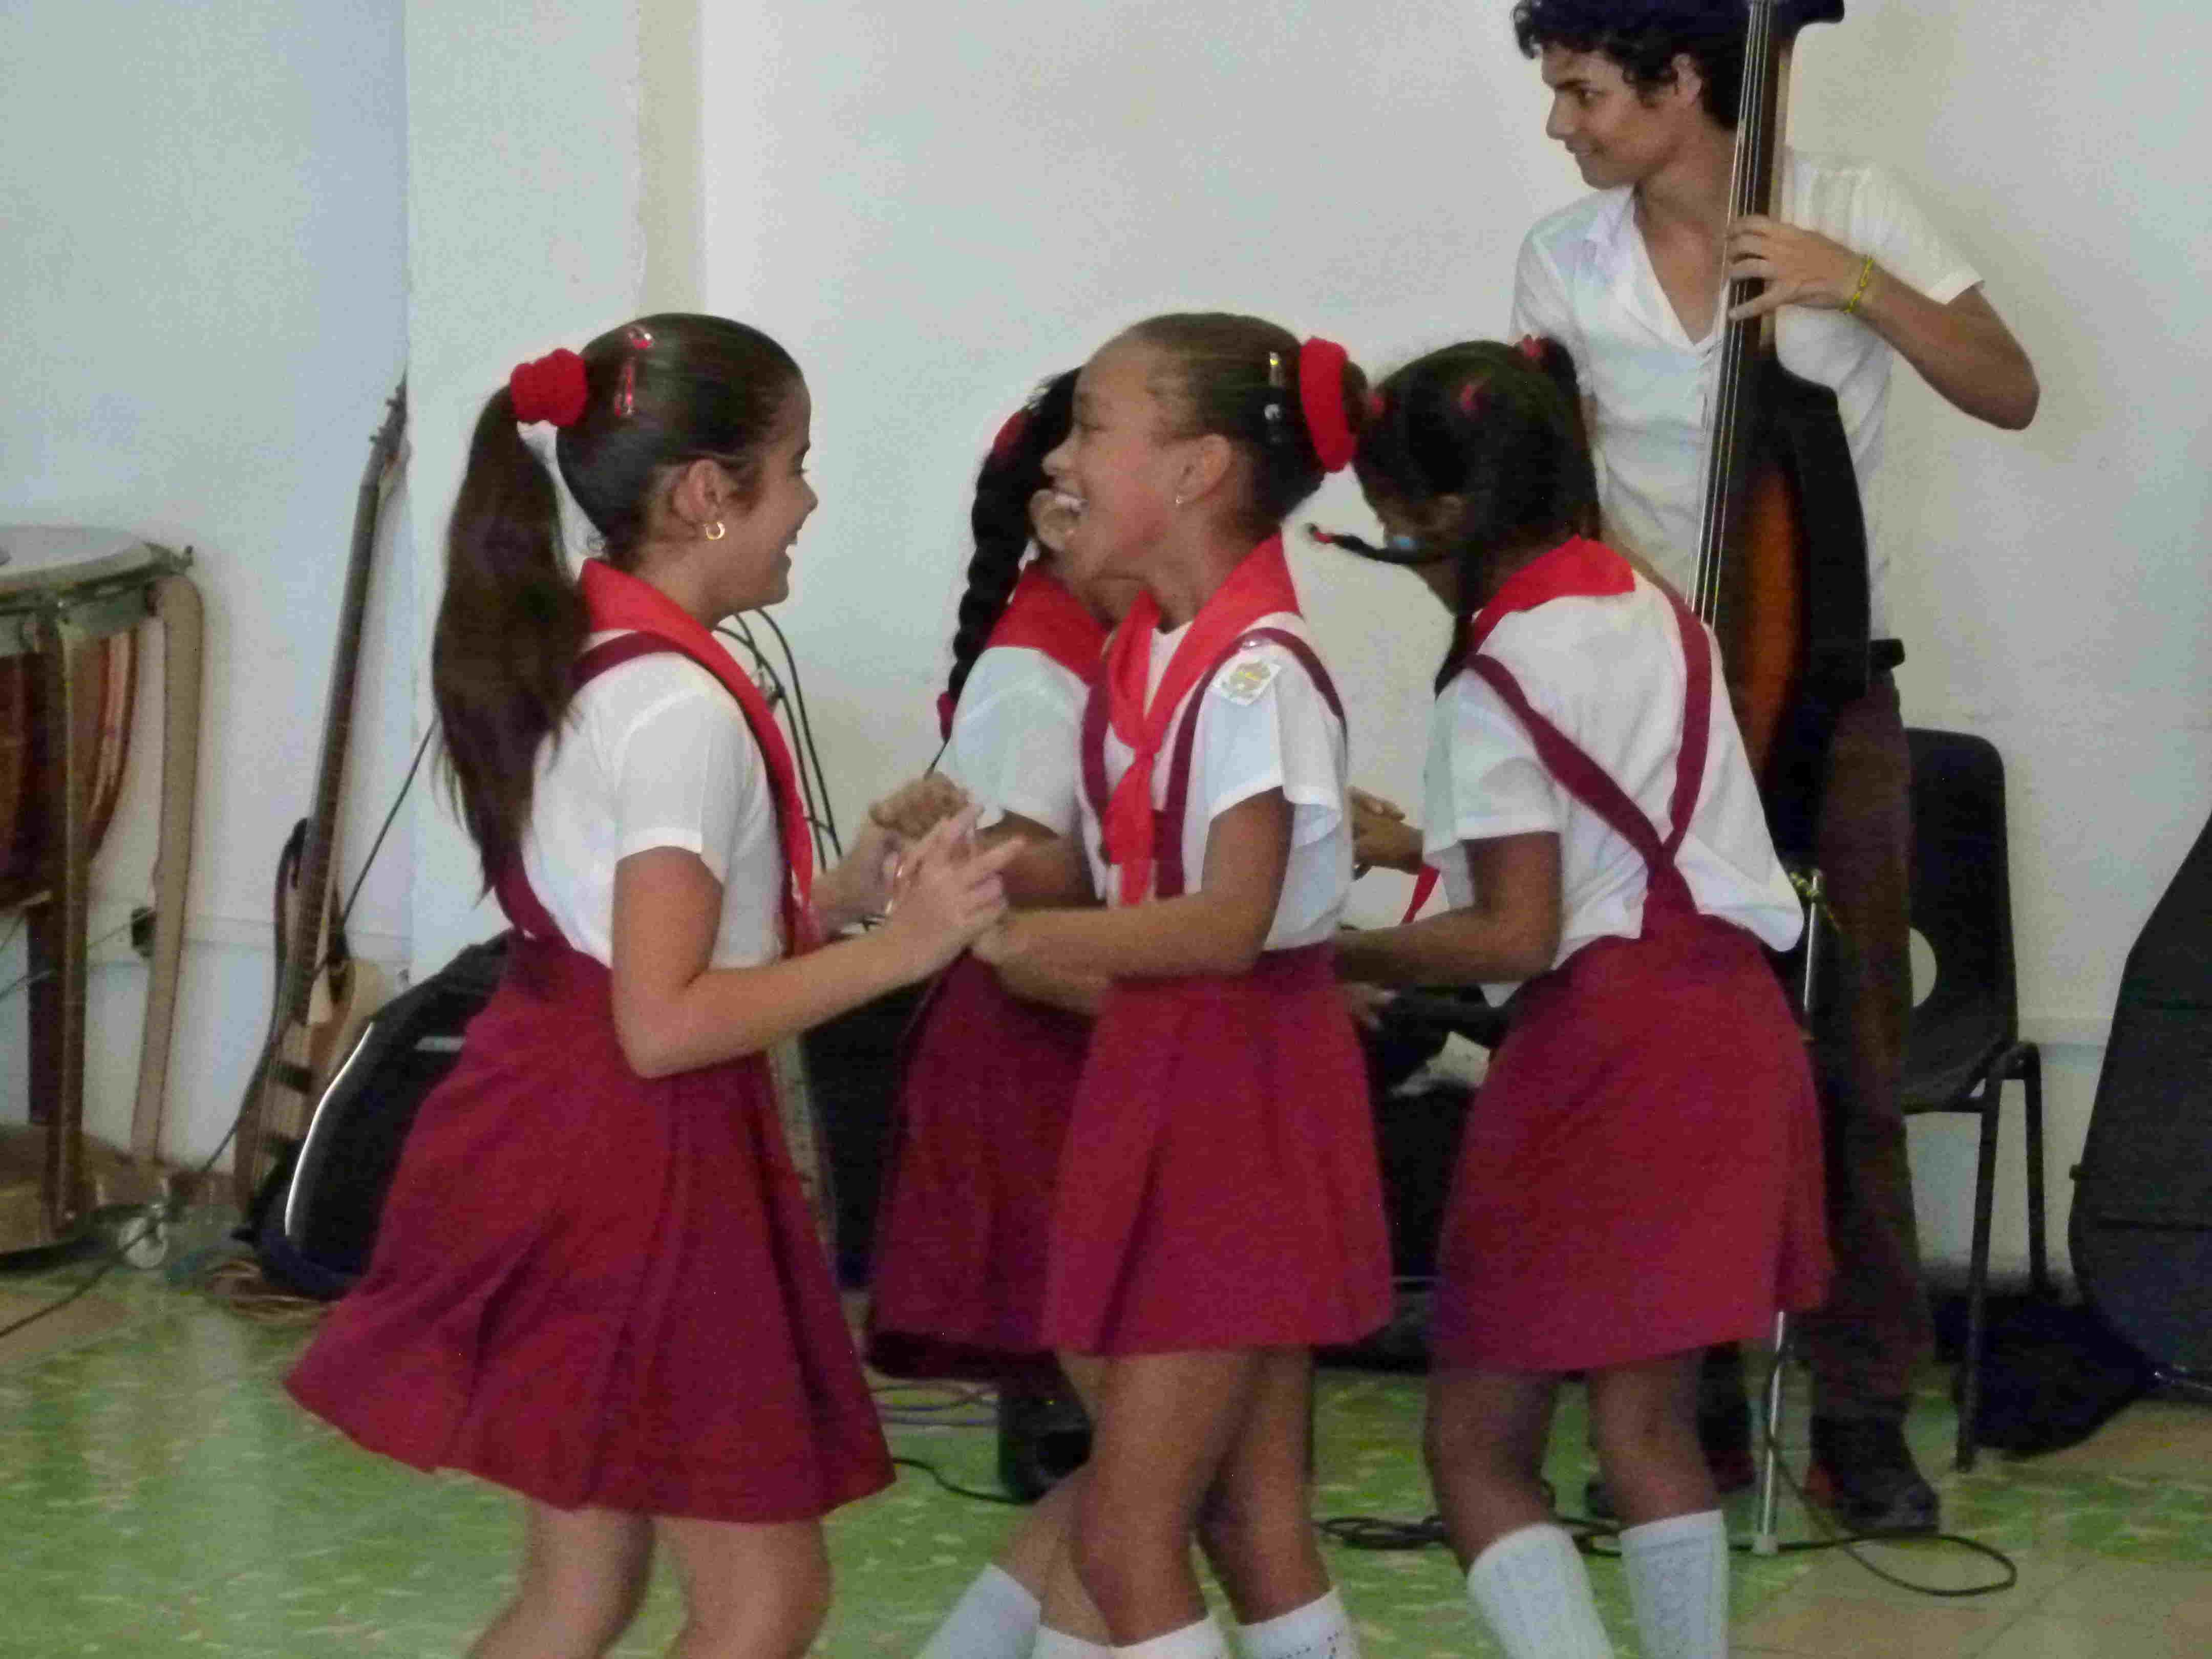 Cuba music tours Cuban cultural travel